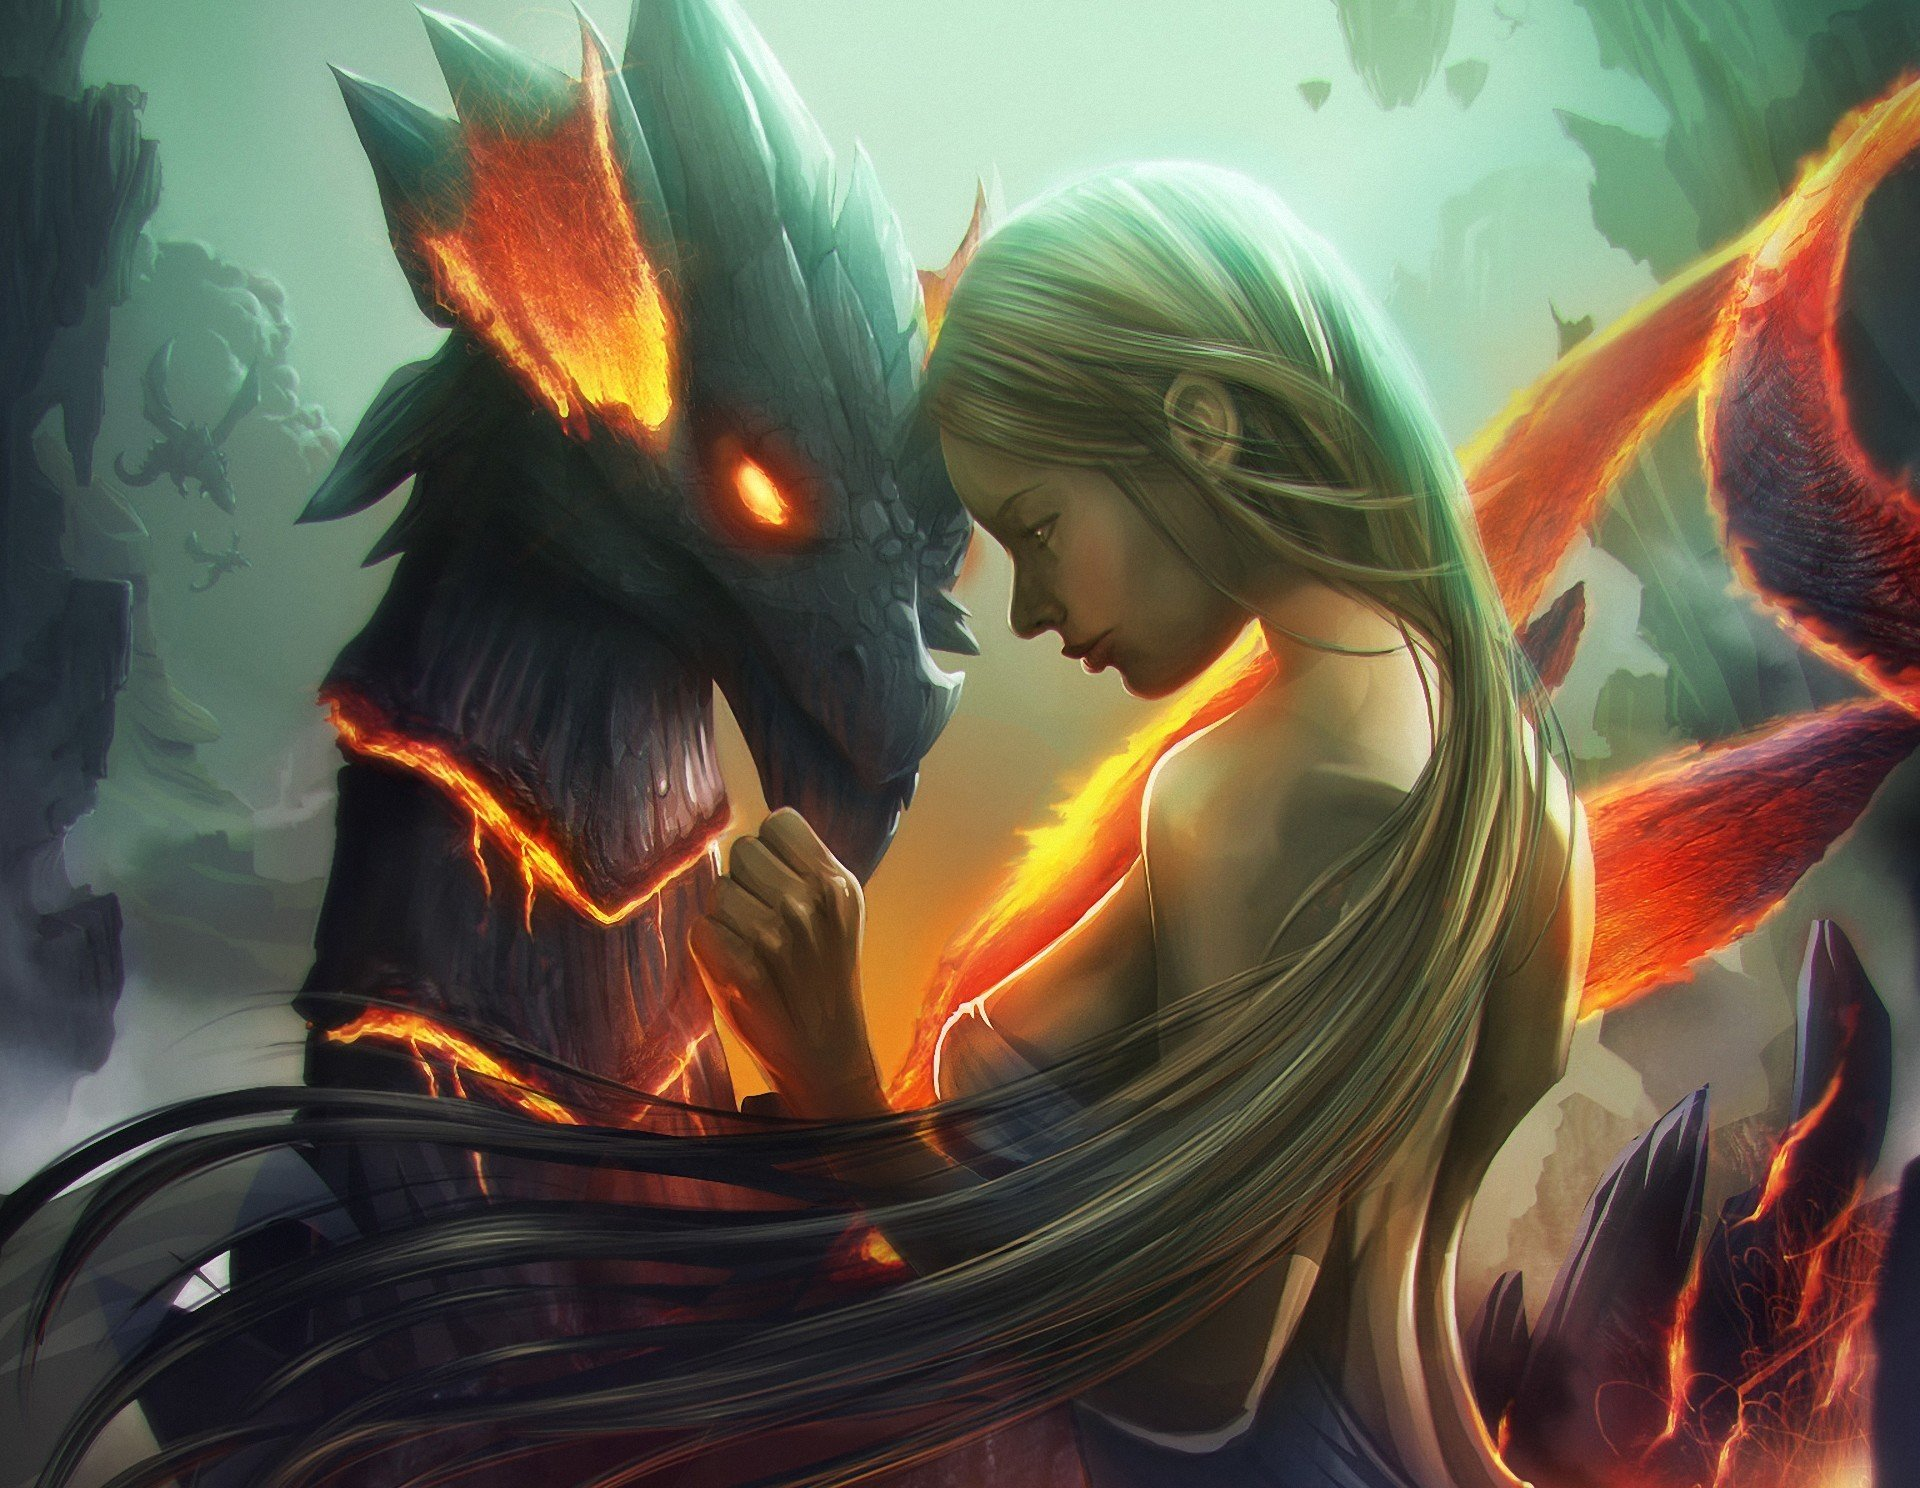 art artwork blond hair blonde dragon fantasy fire girl hair lava long long hair mountains rock